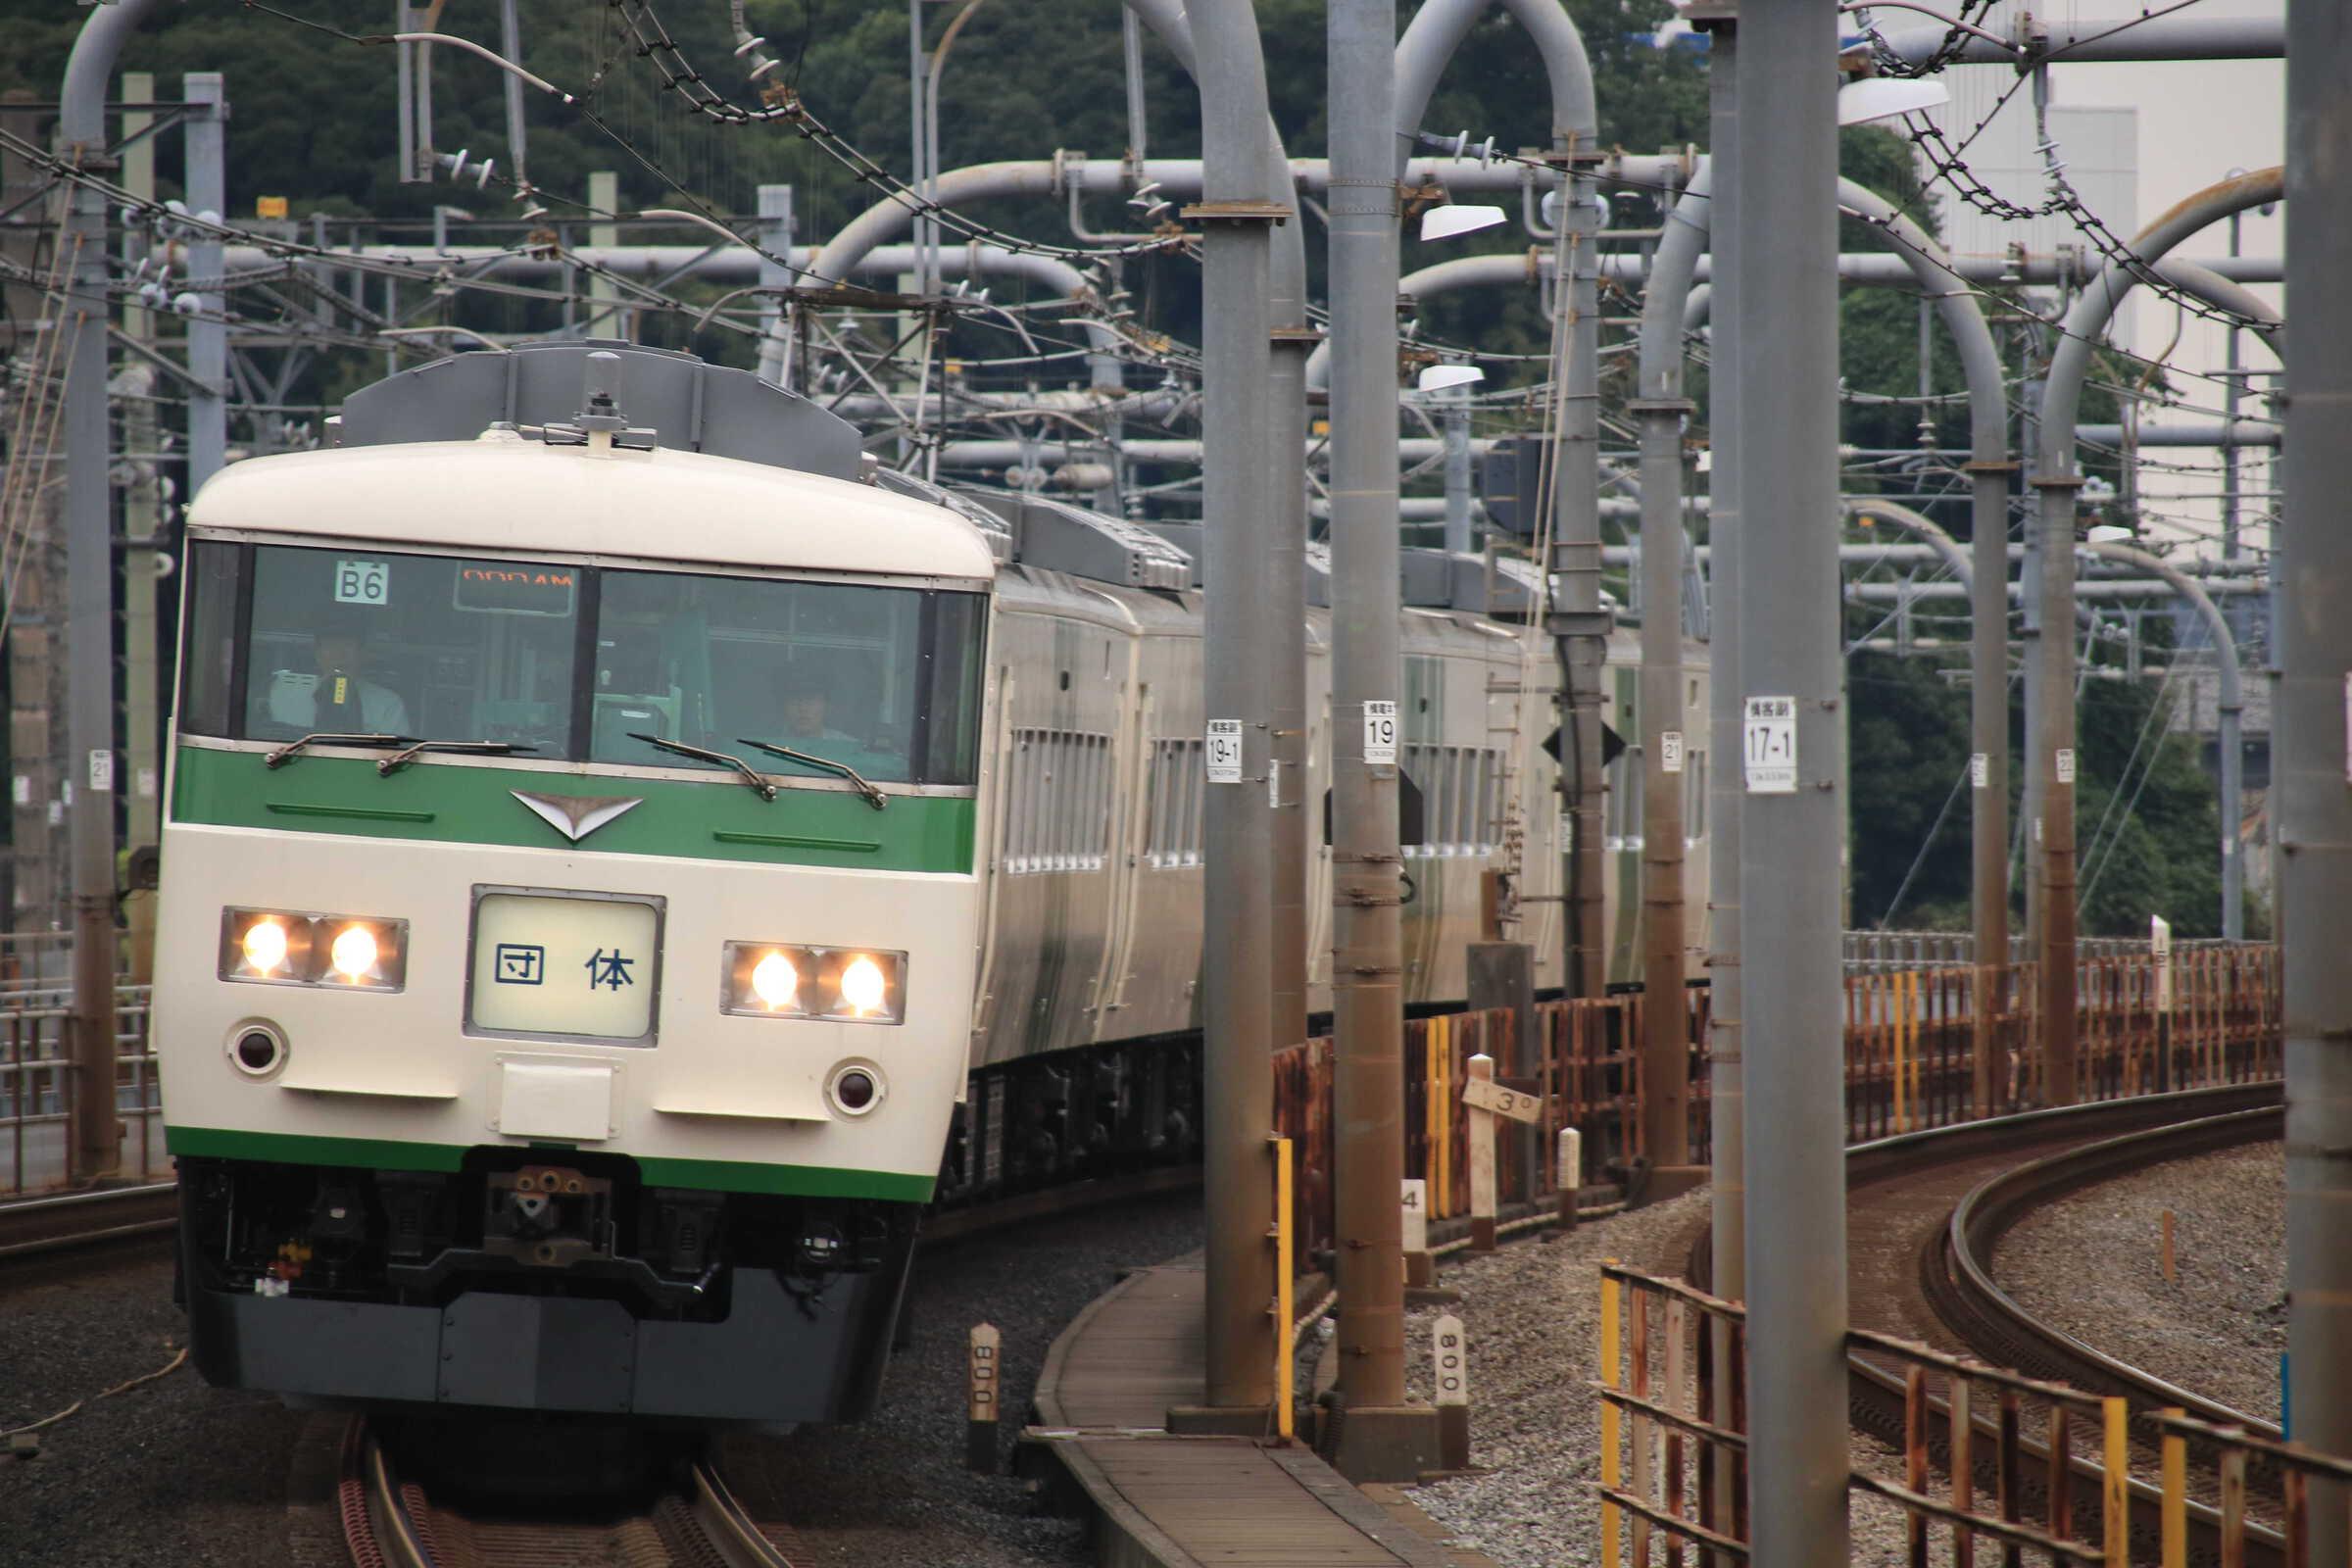 9834M 団臨(高1001, 安中→上野) 第24回 旅のプレゼント(信越線) 185系 宮オオB6編成